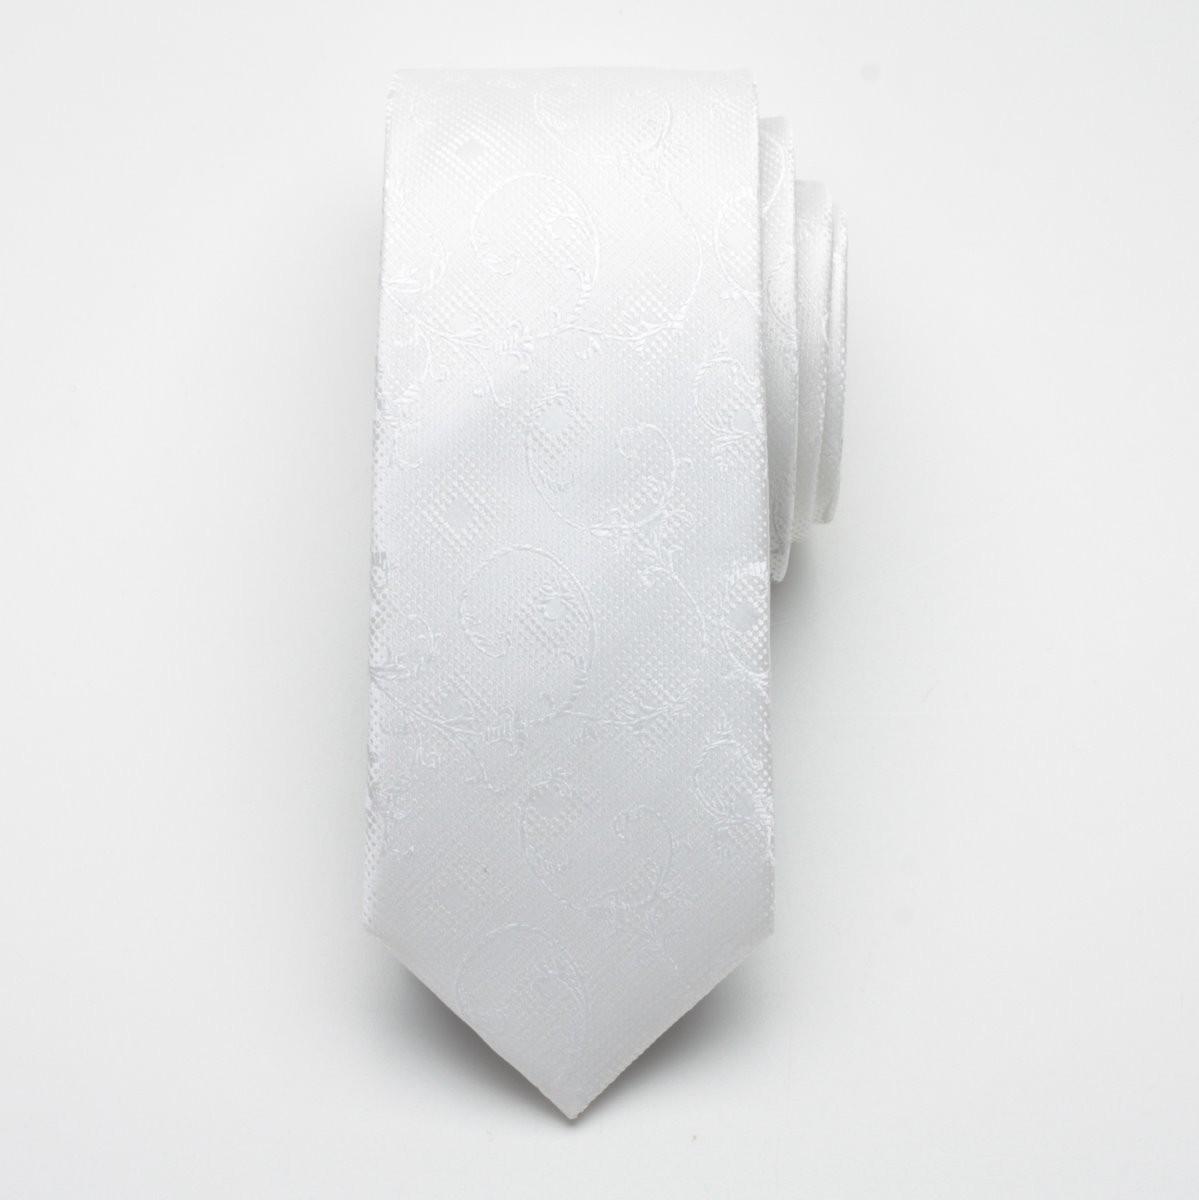 Krawat ślubny (wzór 1)